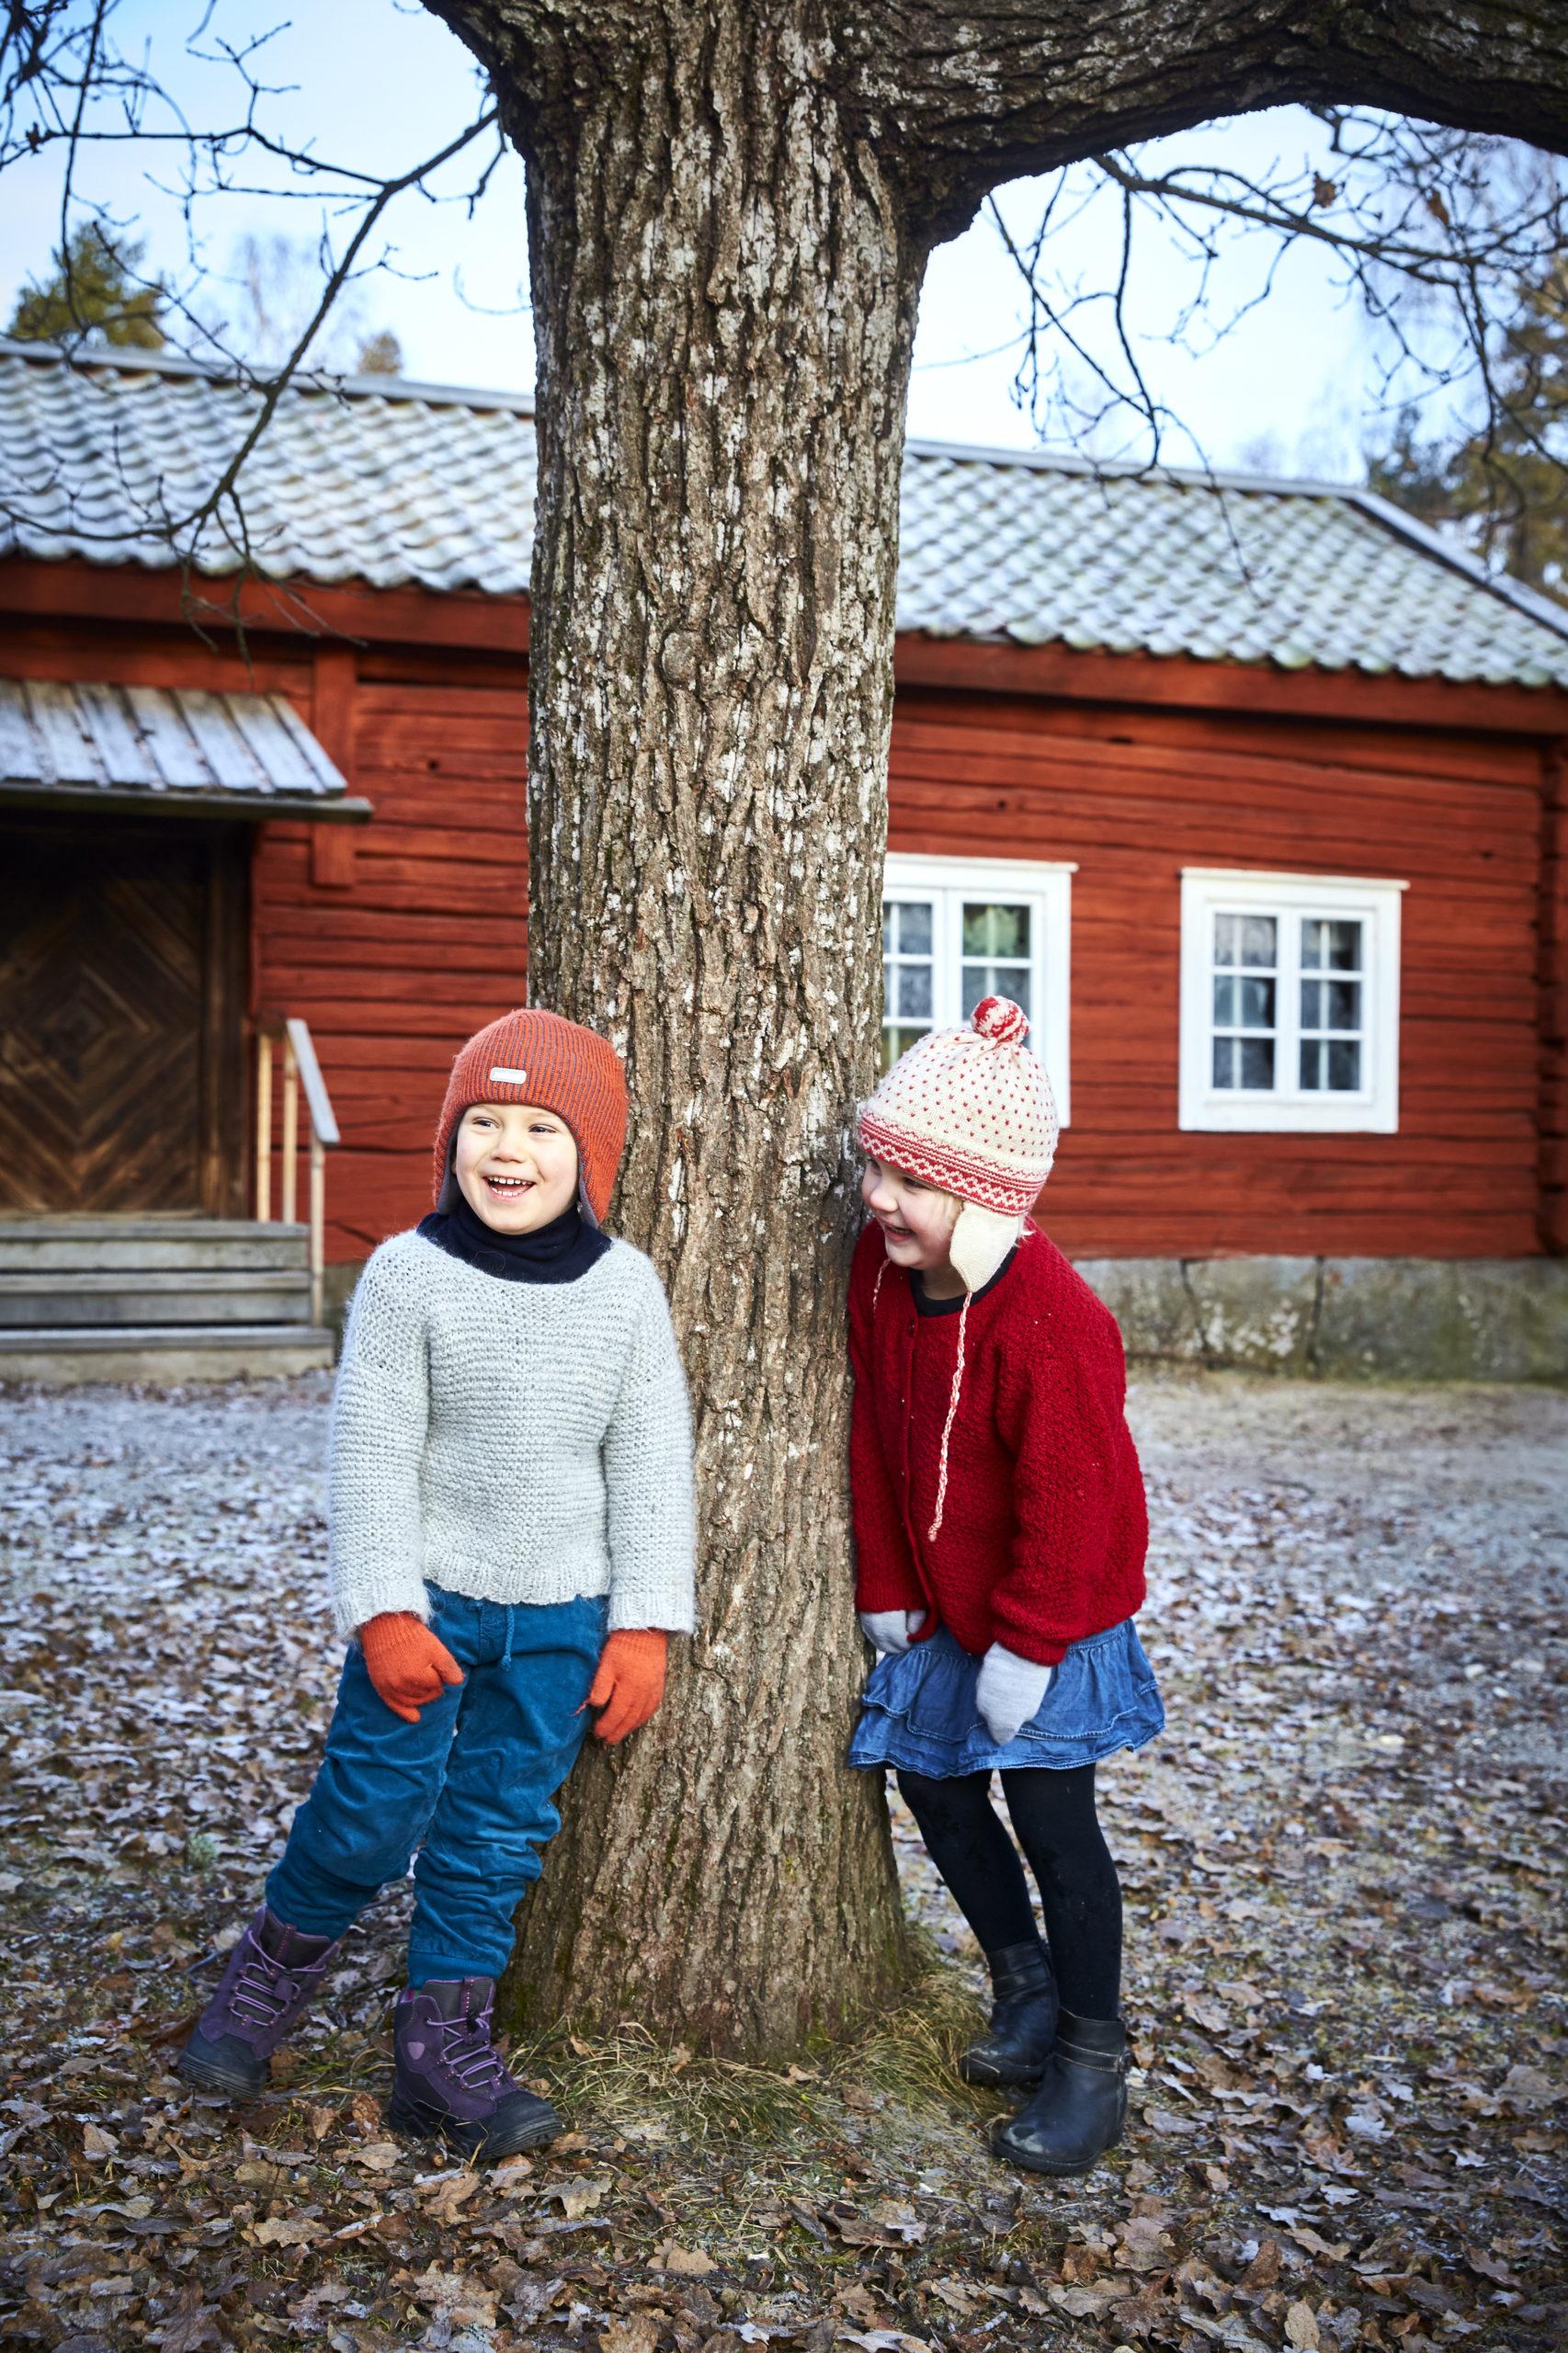 Barn på Vallby Friluftsmuseum. Fotograf: Pia Nordlander